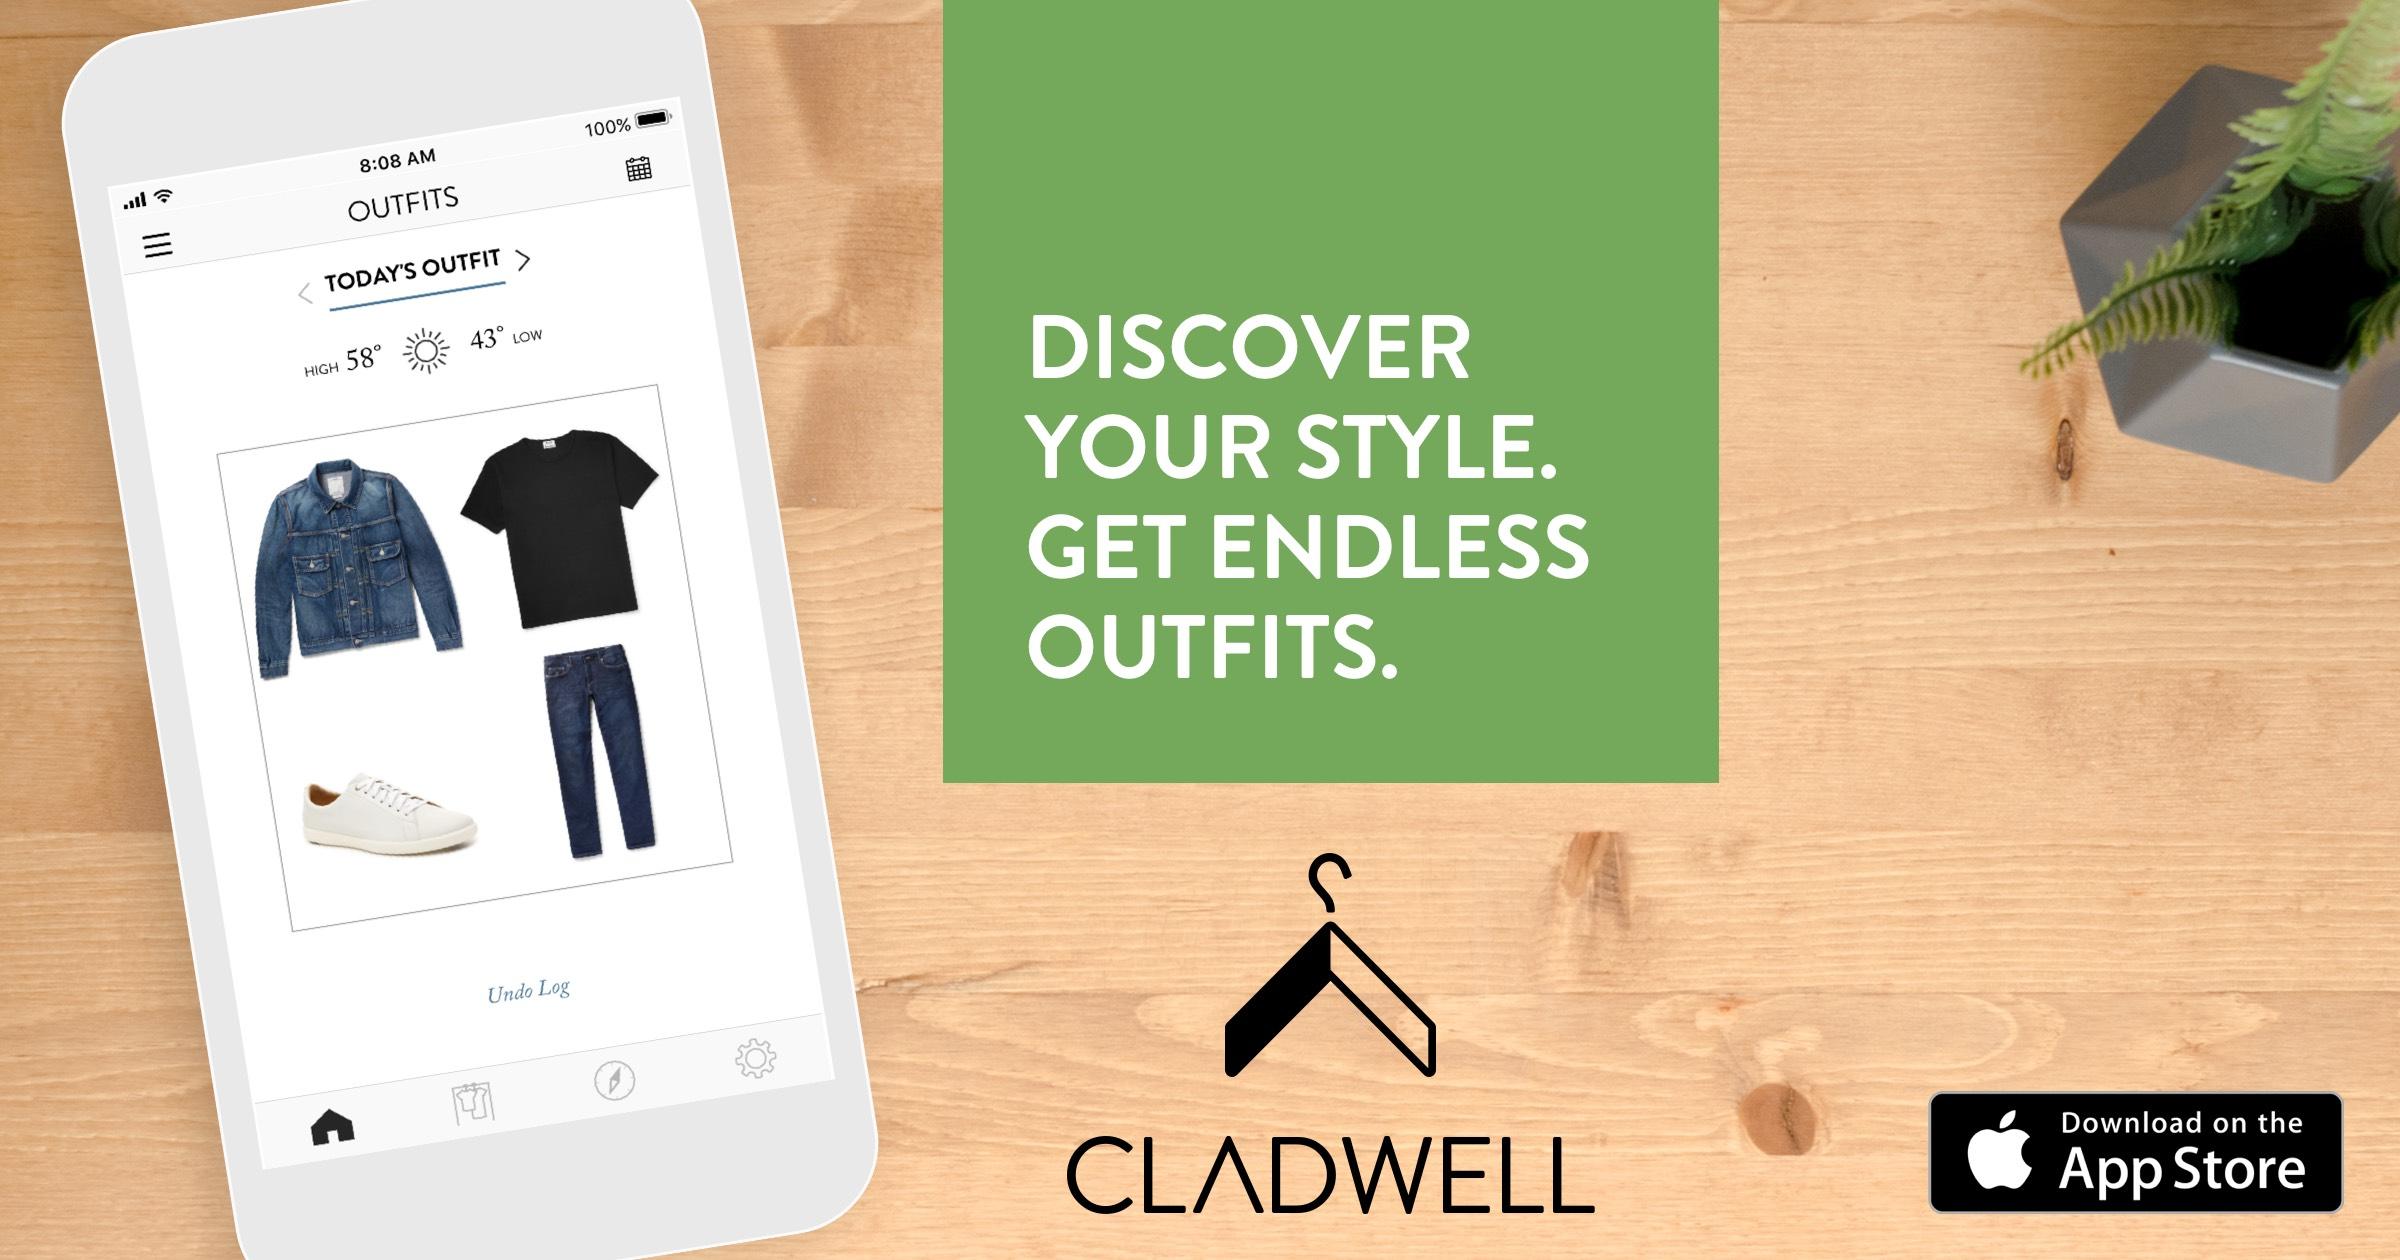 Cladwell Social Image.jpg